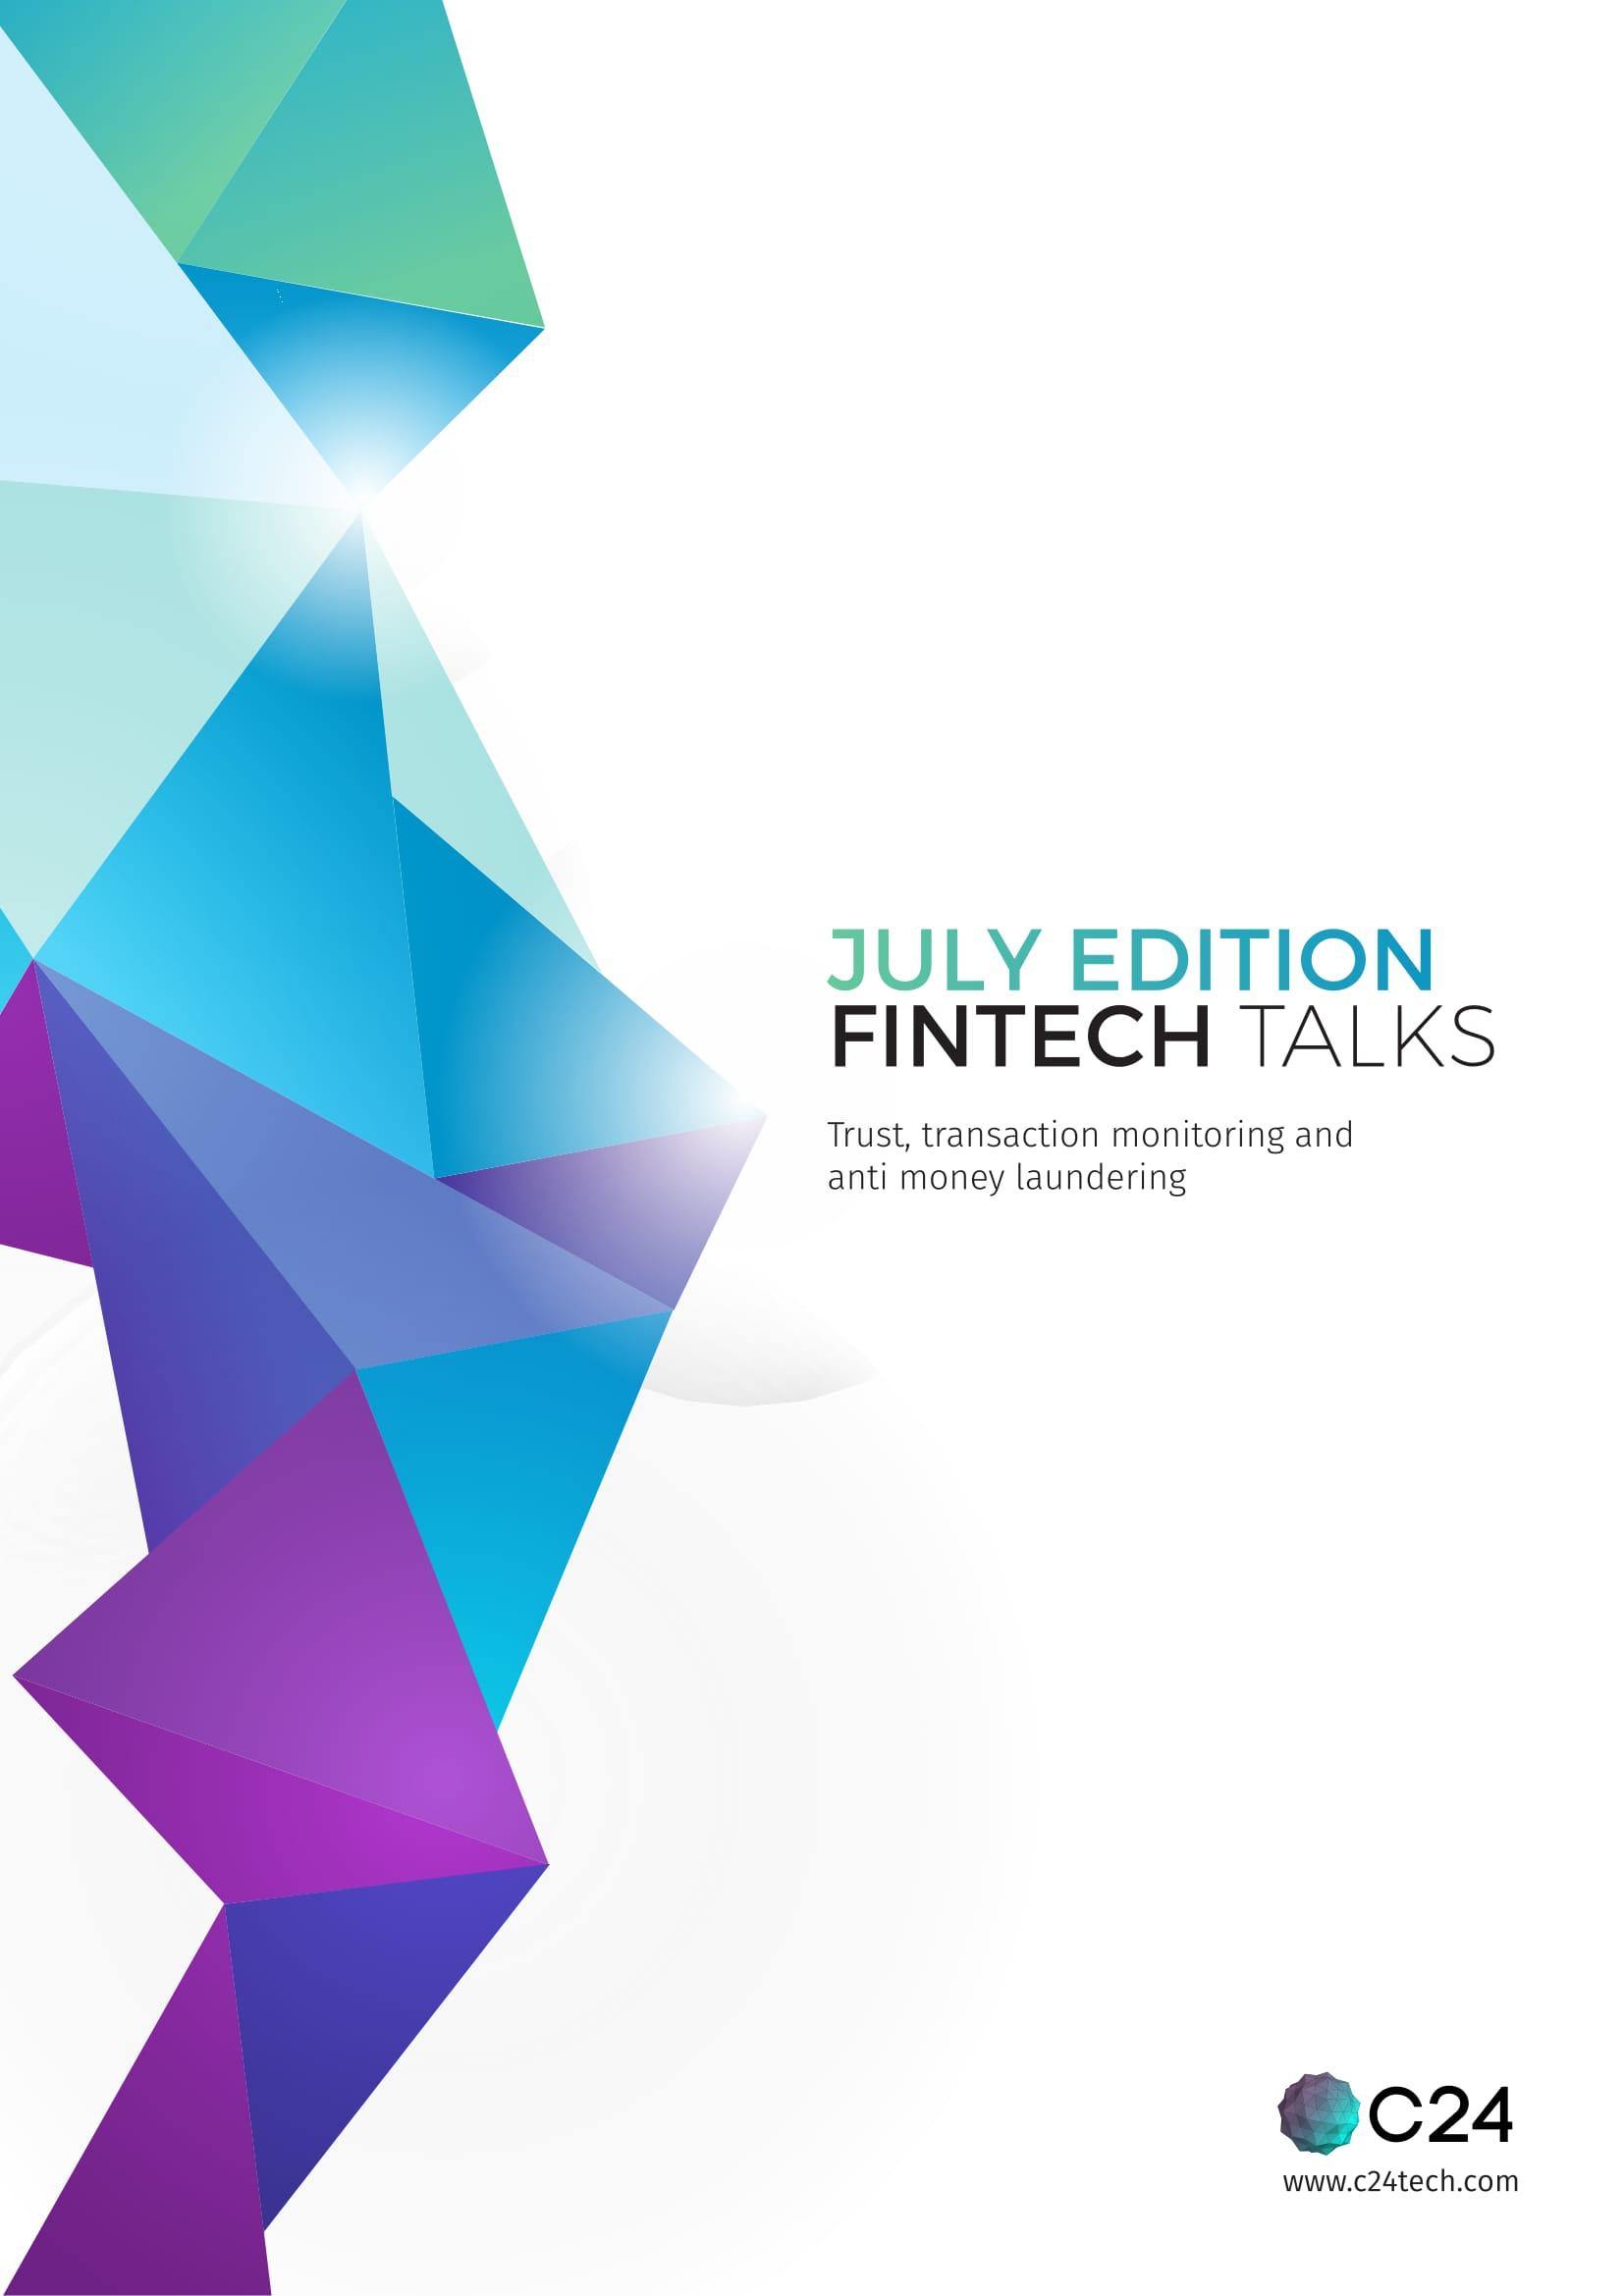 C24_FinTech_Talks_-_July_Edition-1.jpg